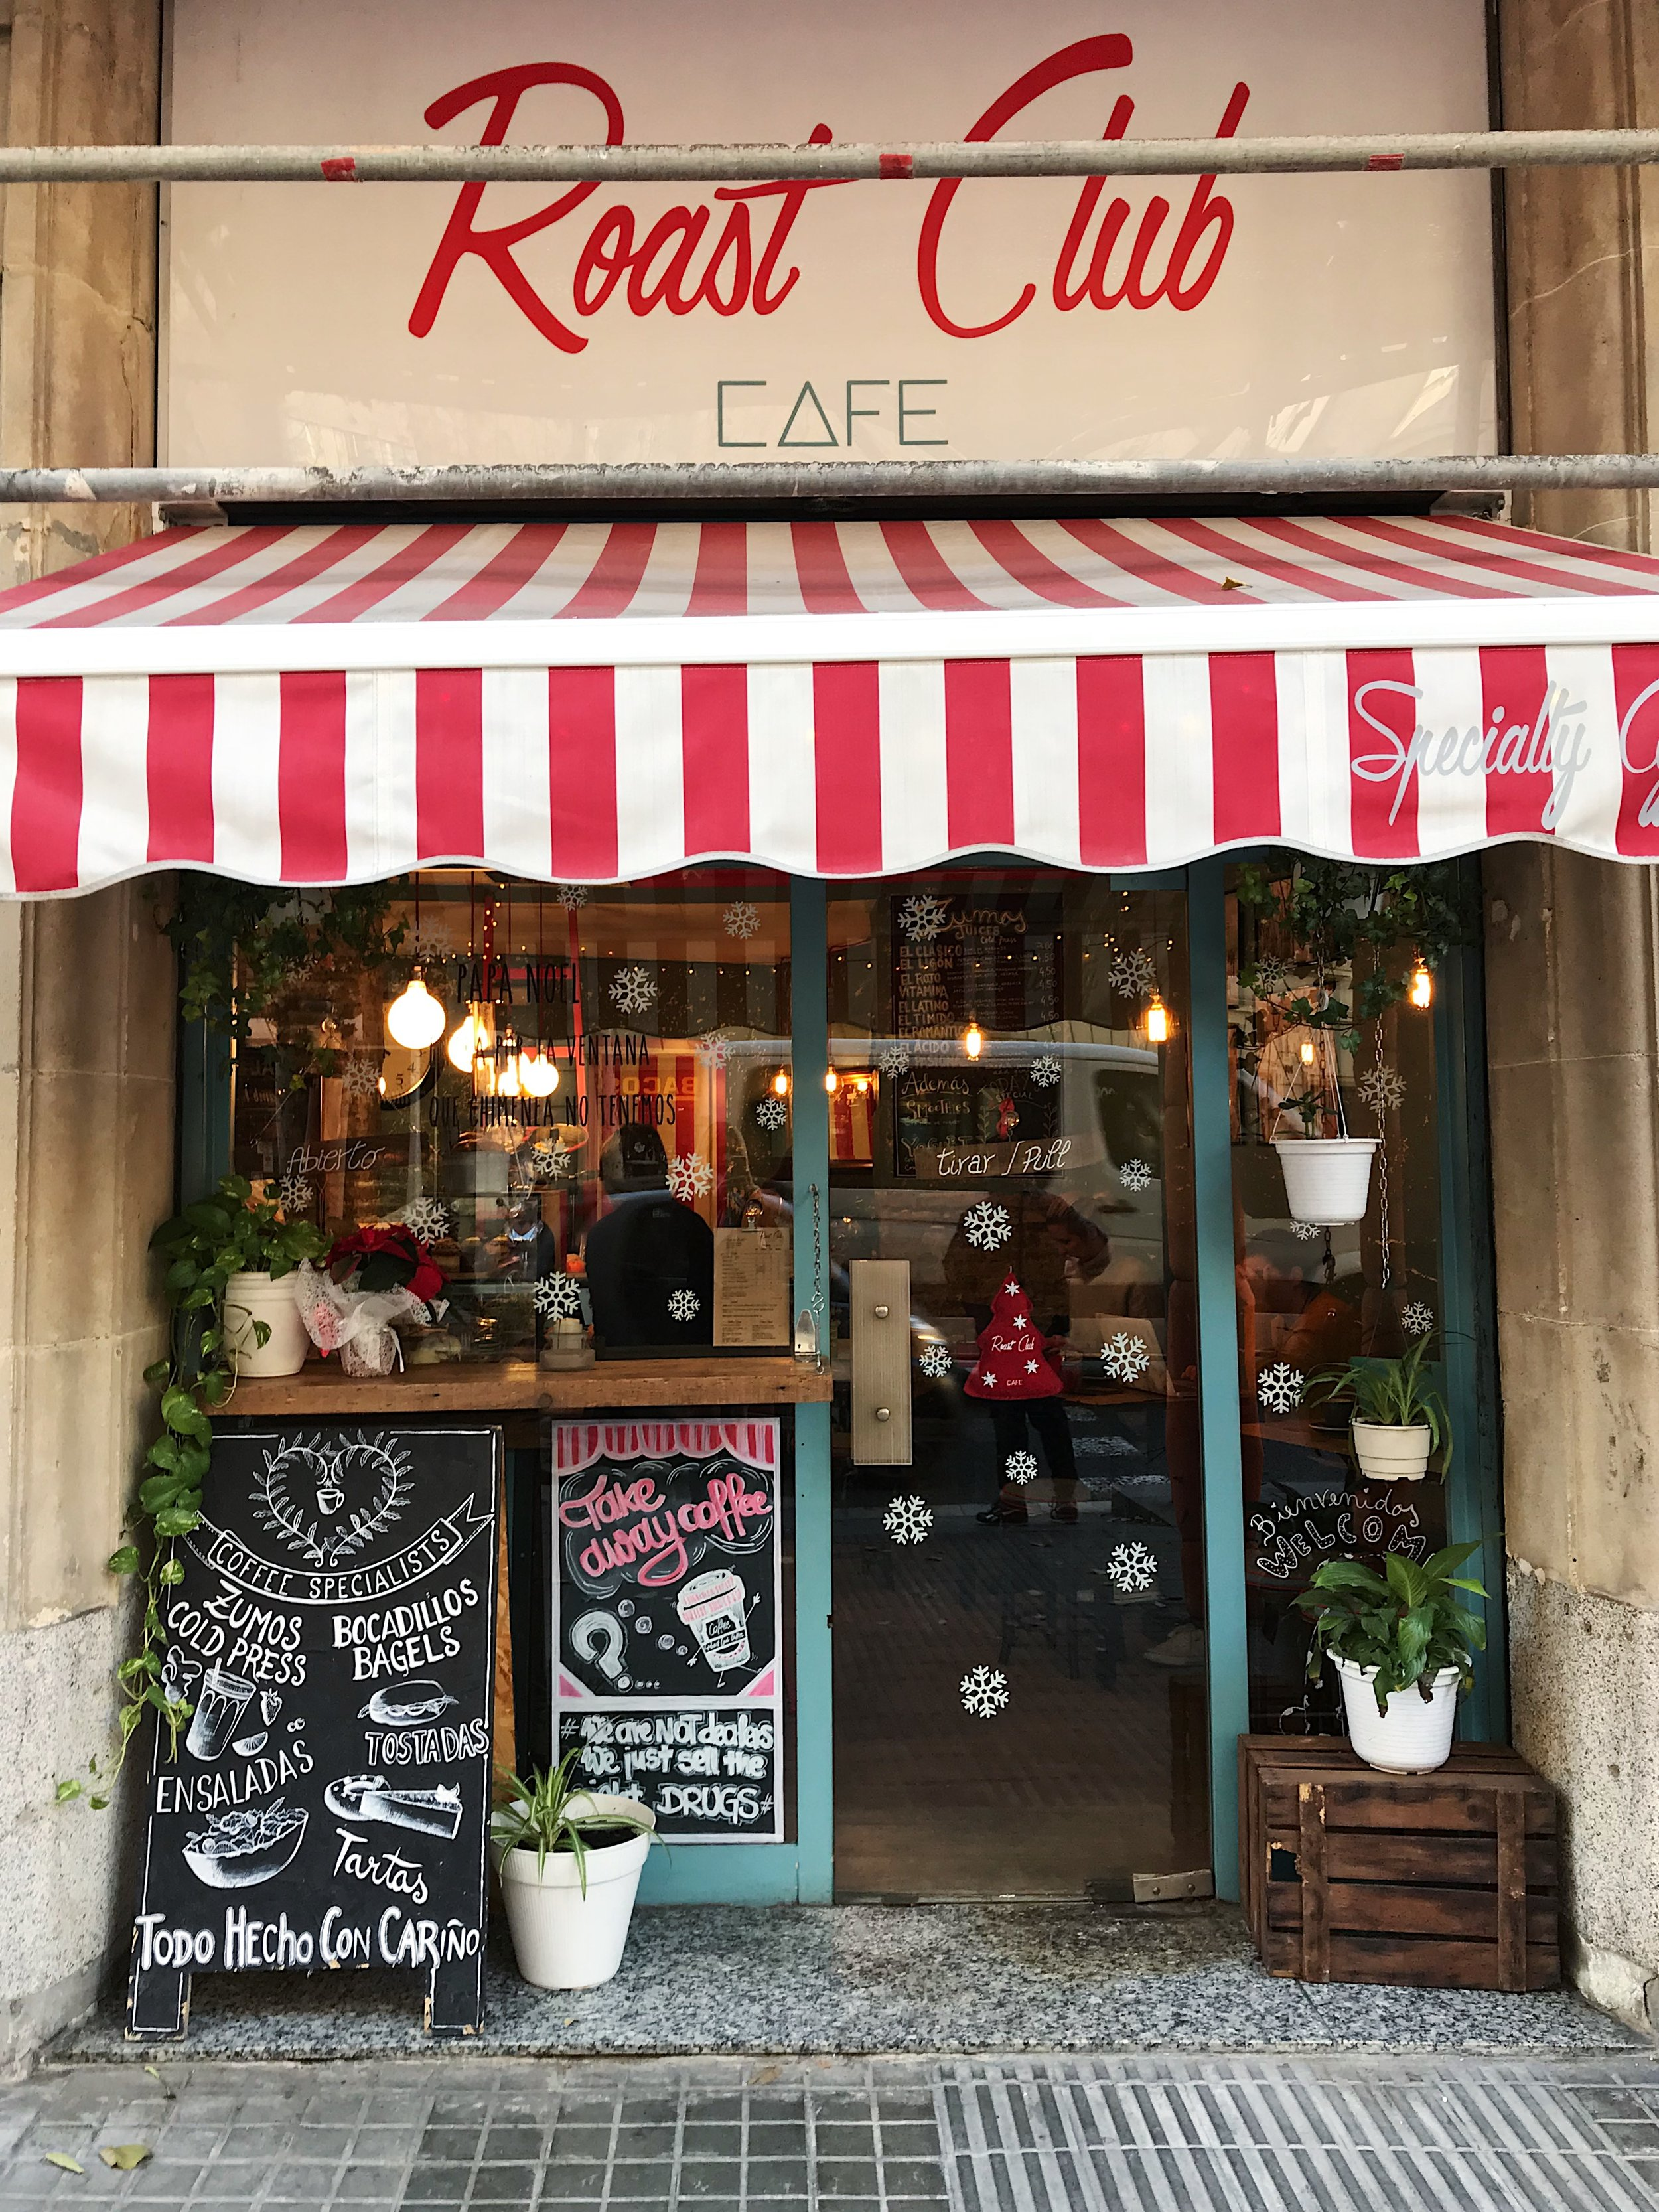 Roast Club Café, Barcelona